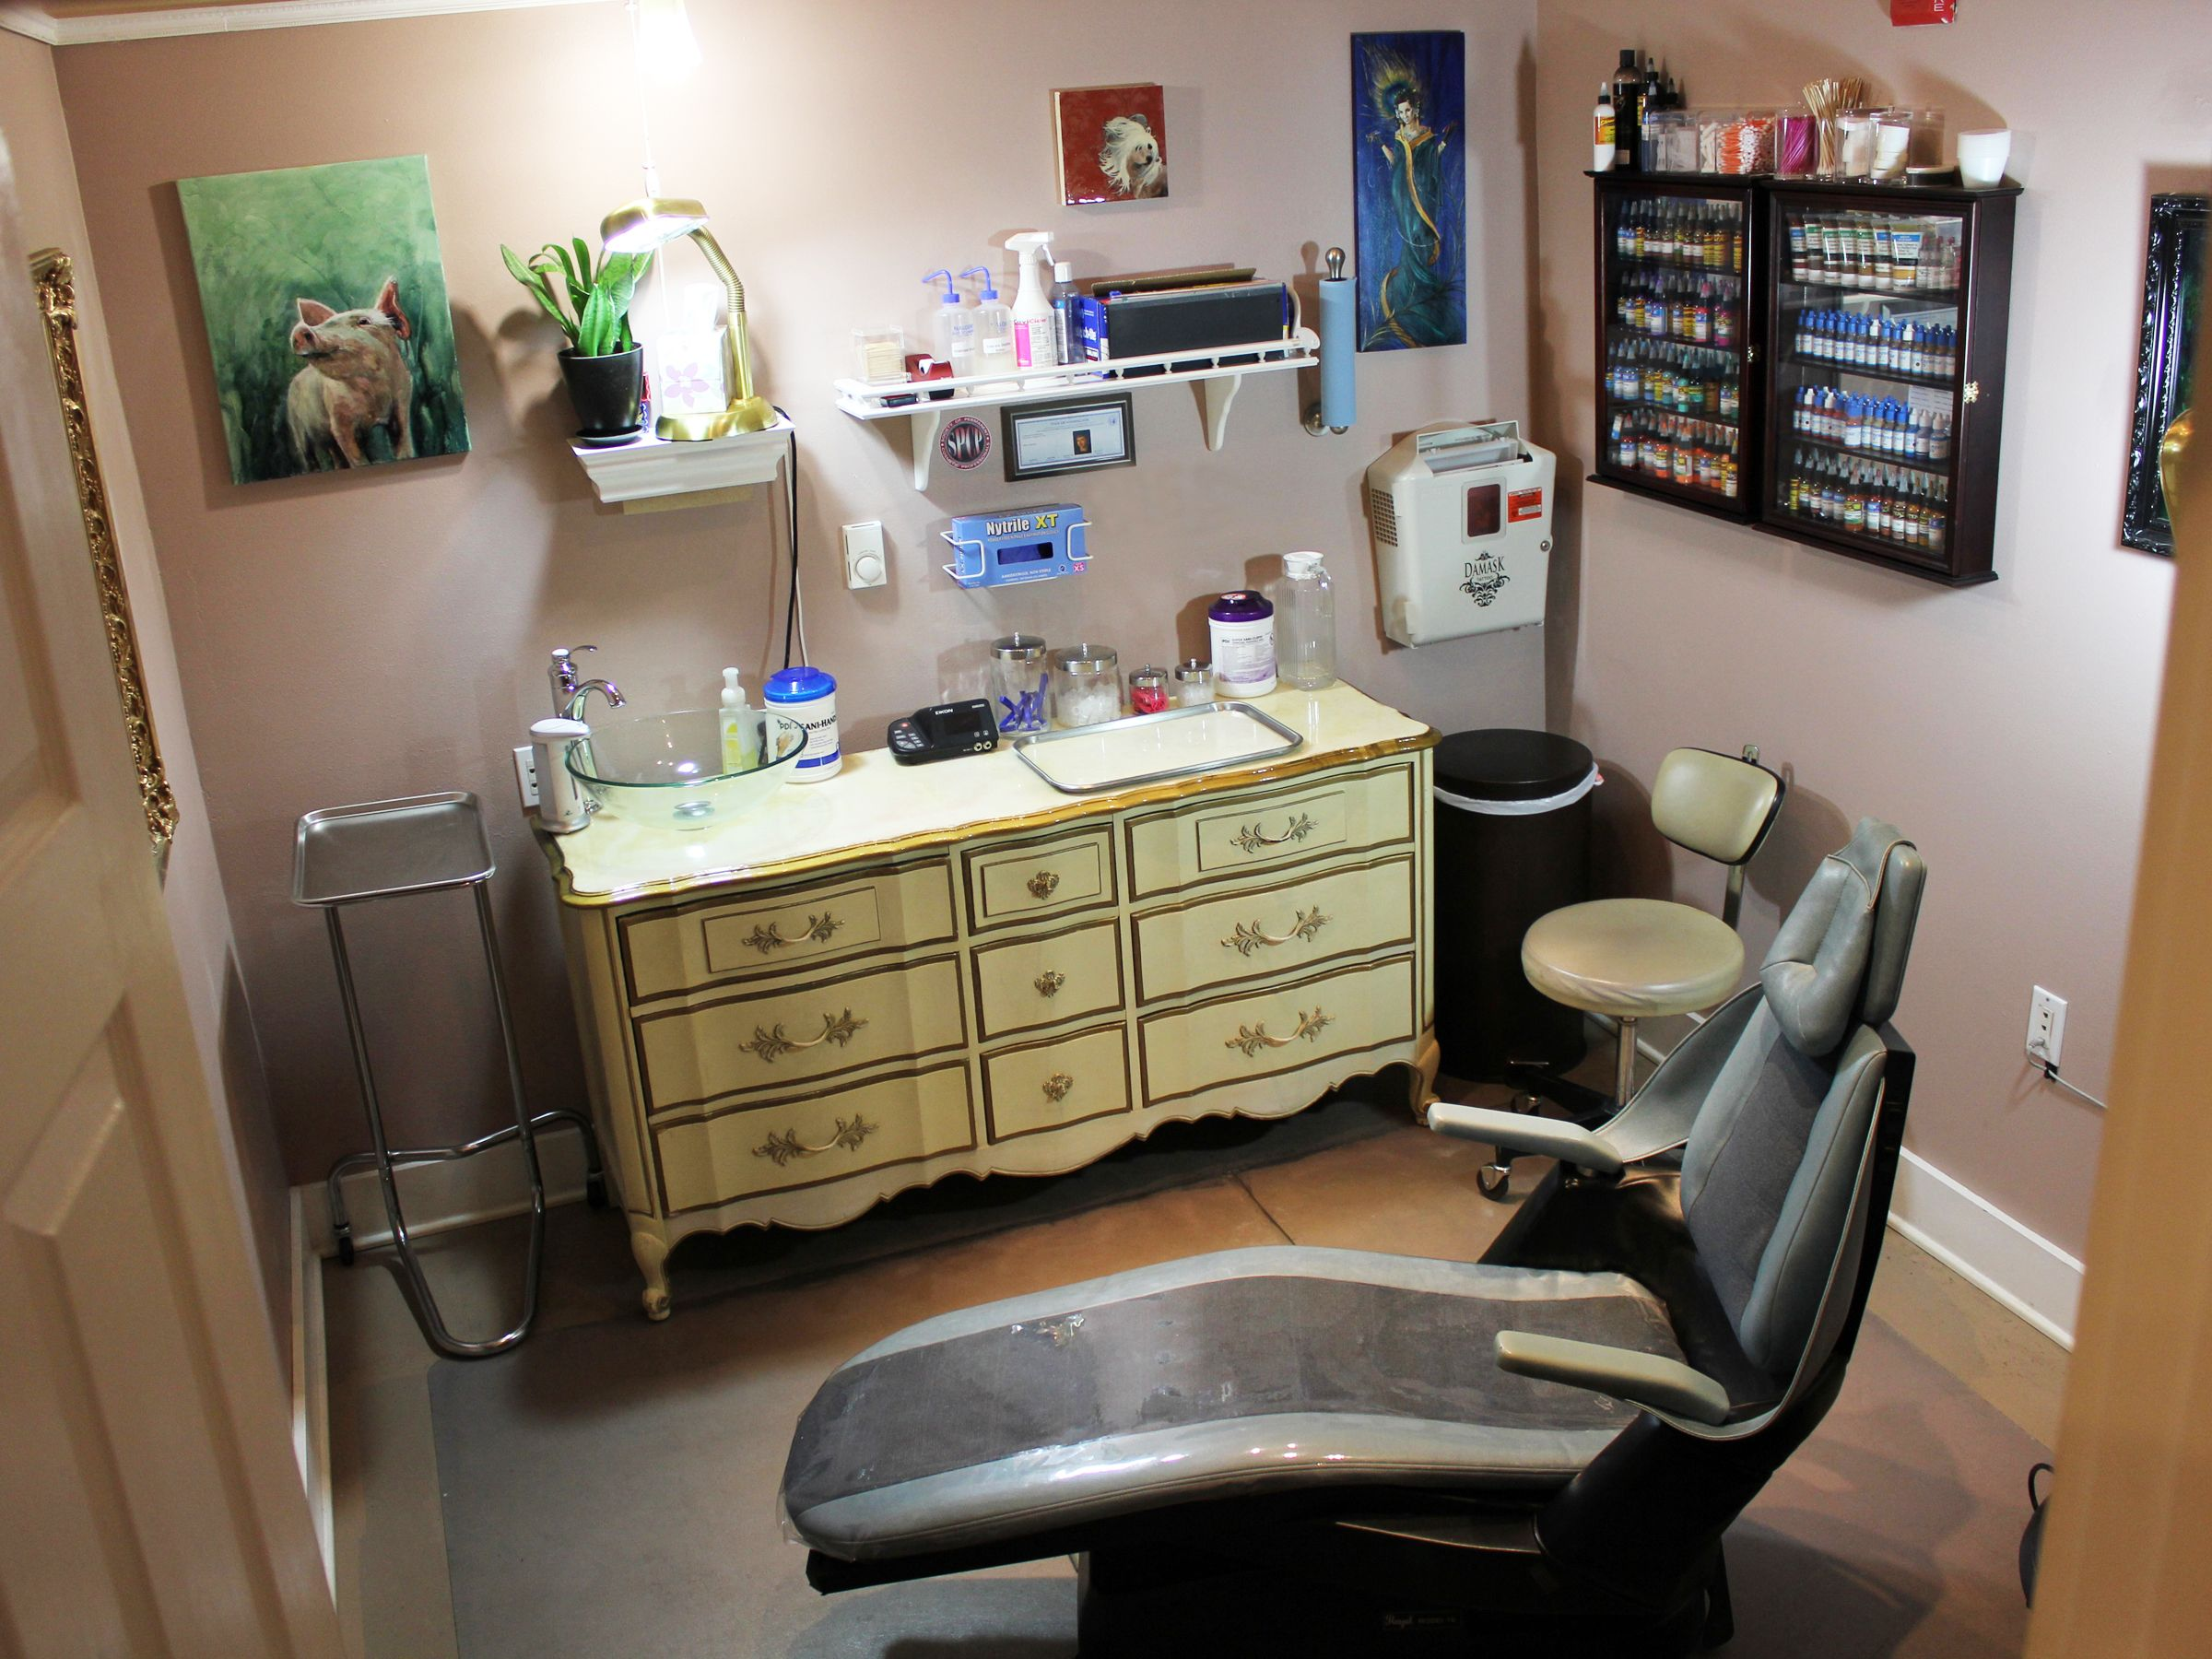 Christy brooker 39 s tattoo room at damask tattoo tattooing pinterest damask tattoo damasks - Tattoo studio decor ...